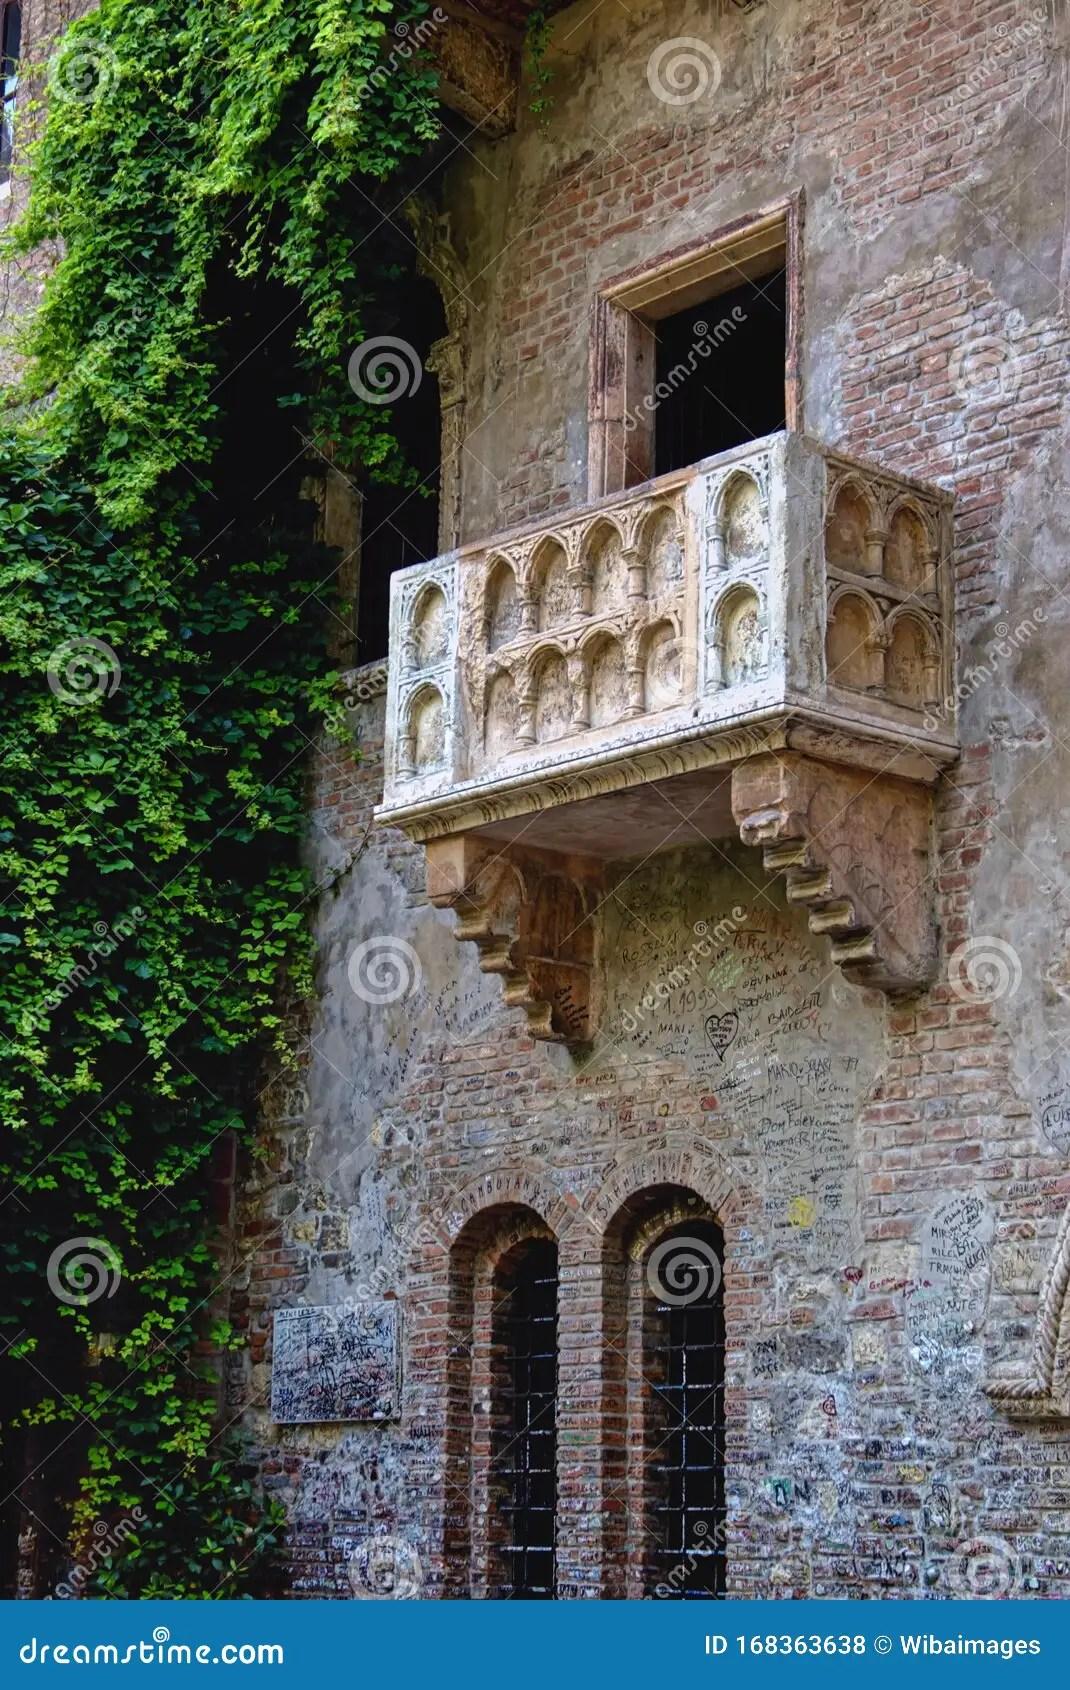 Casa Di Giulietta Verona Italy Editorial Stock Photo Image Of Europe Attraction 168363638